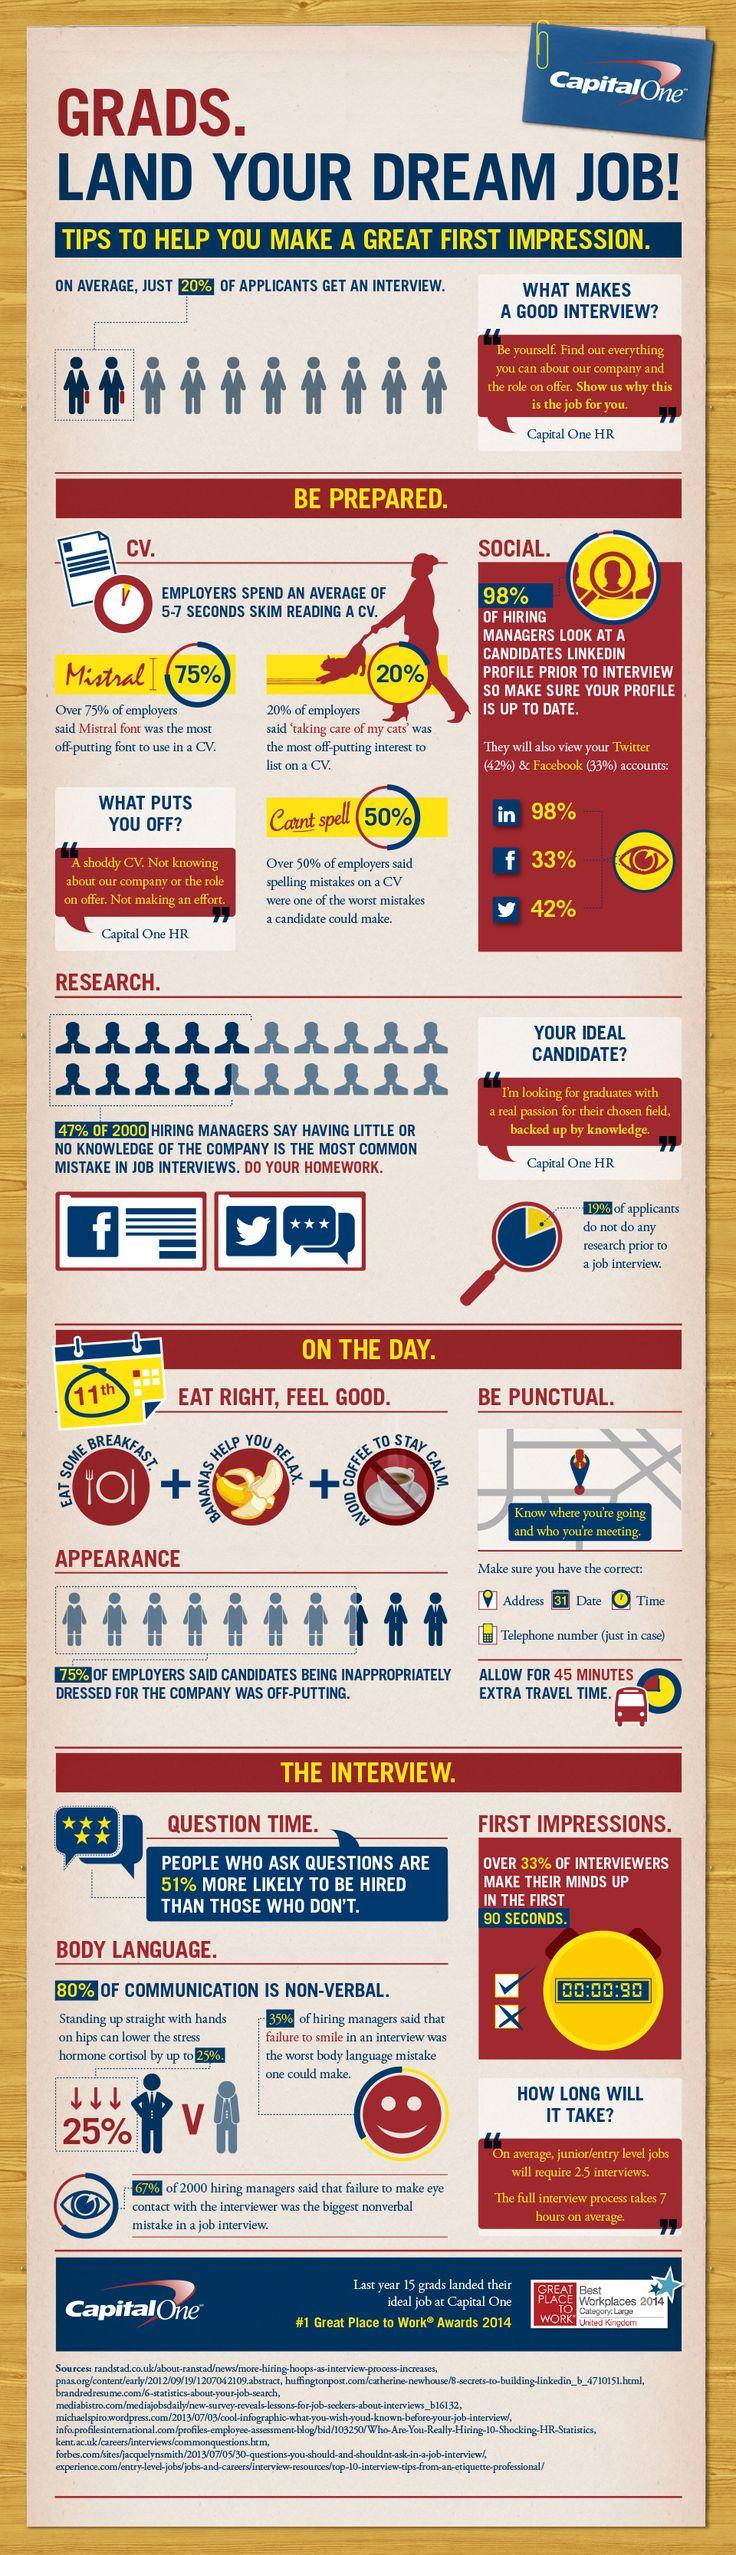 Grads. Land Your Dream Job #infographic #Career #Jobs #Interview #Grads